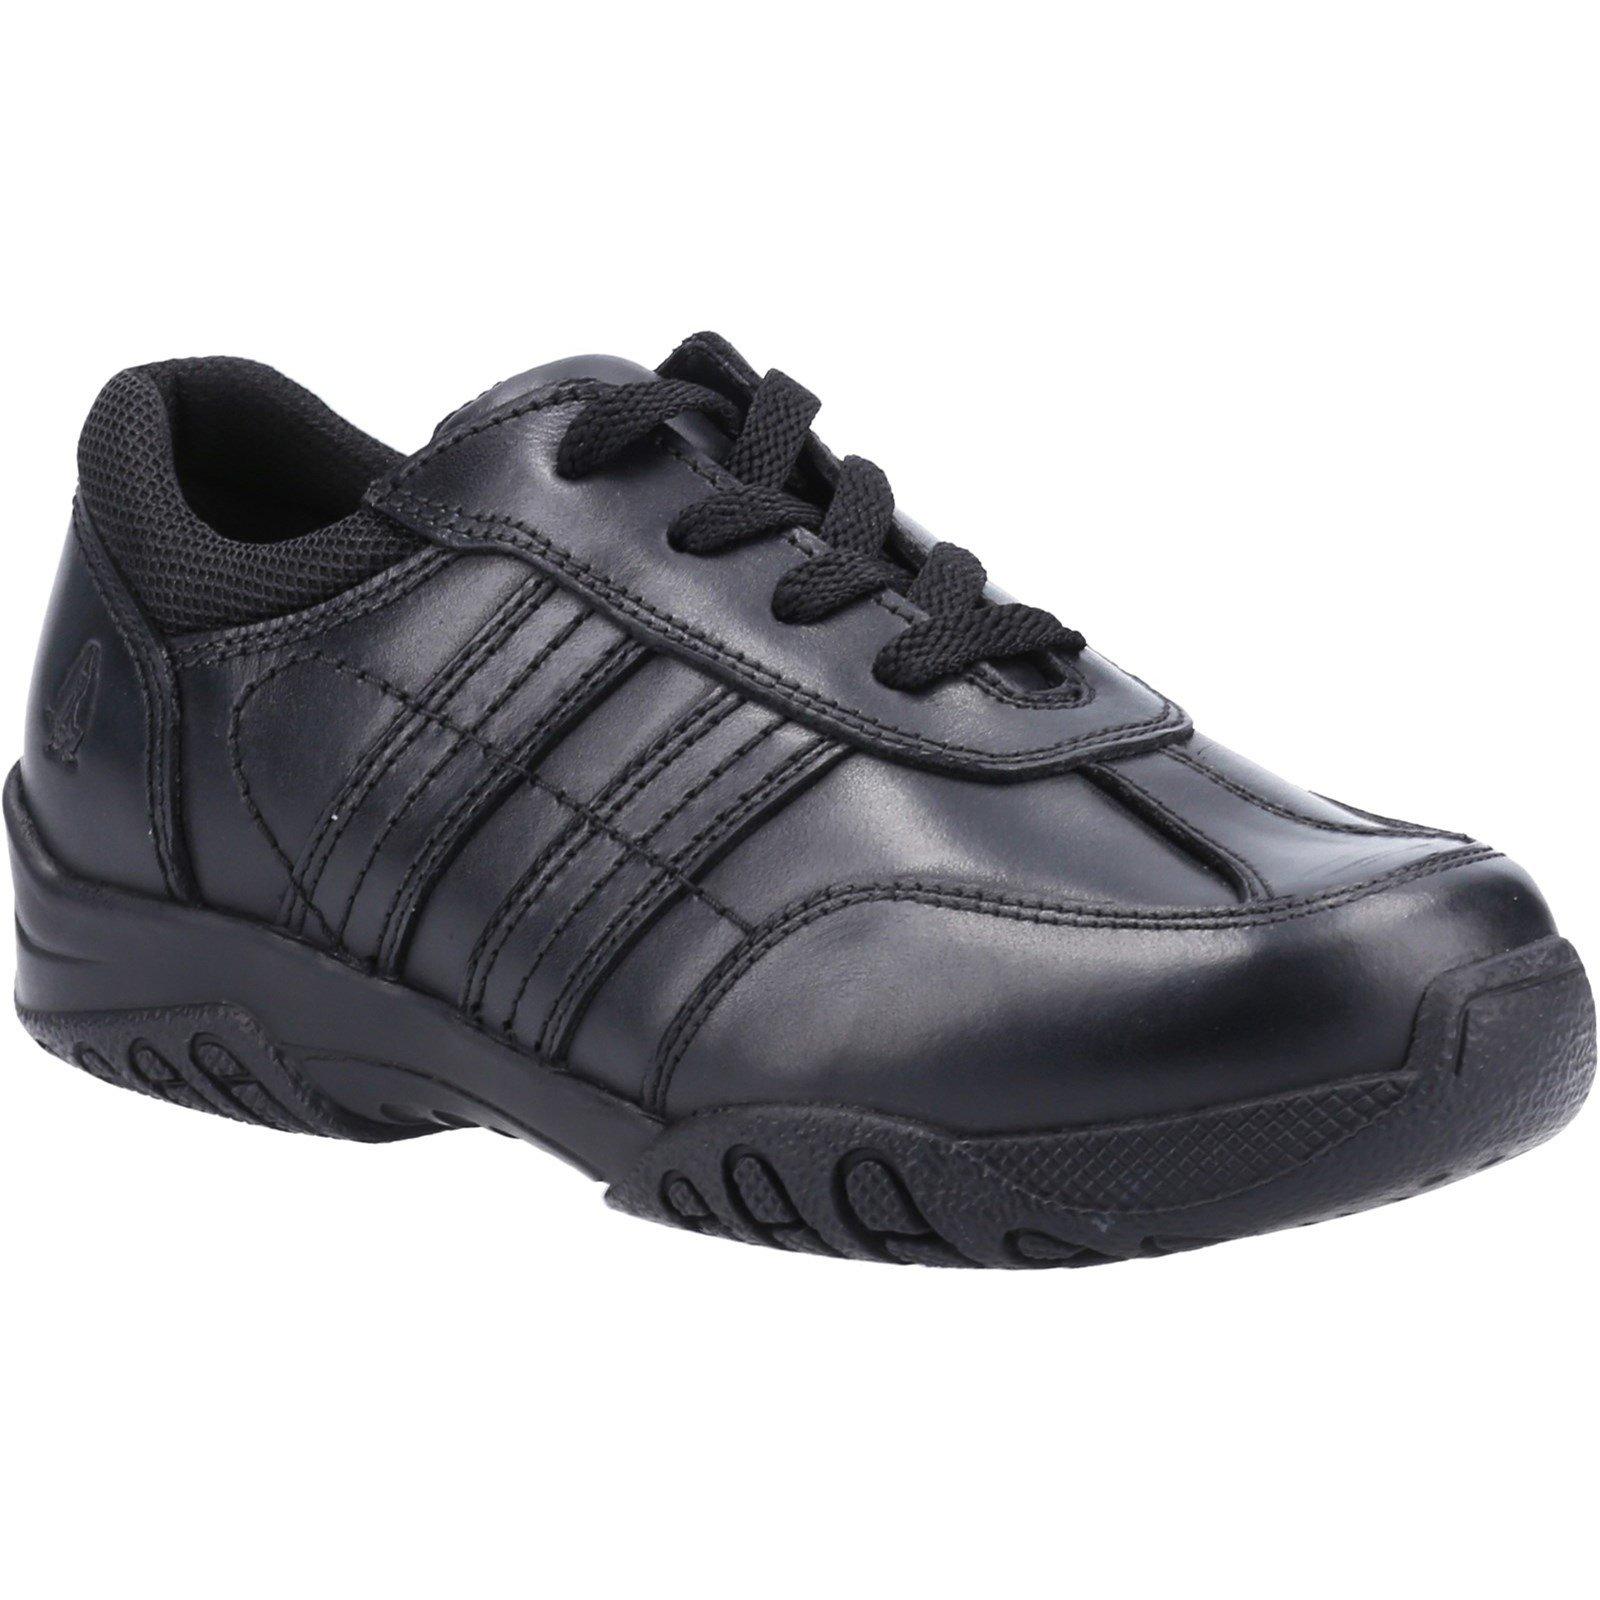 Hush Puppies Kid's Jezza2 Junior School Shoe Black 32606 - Black 12